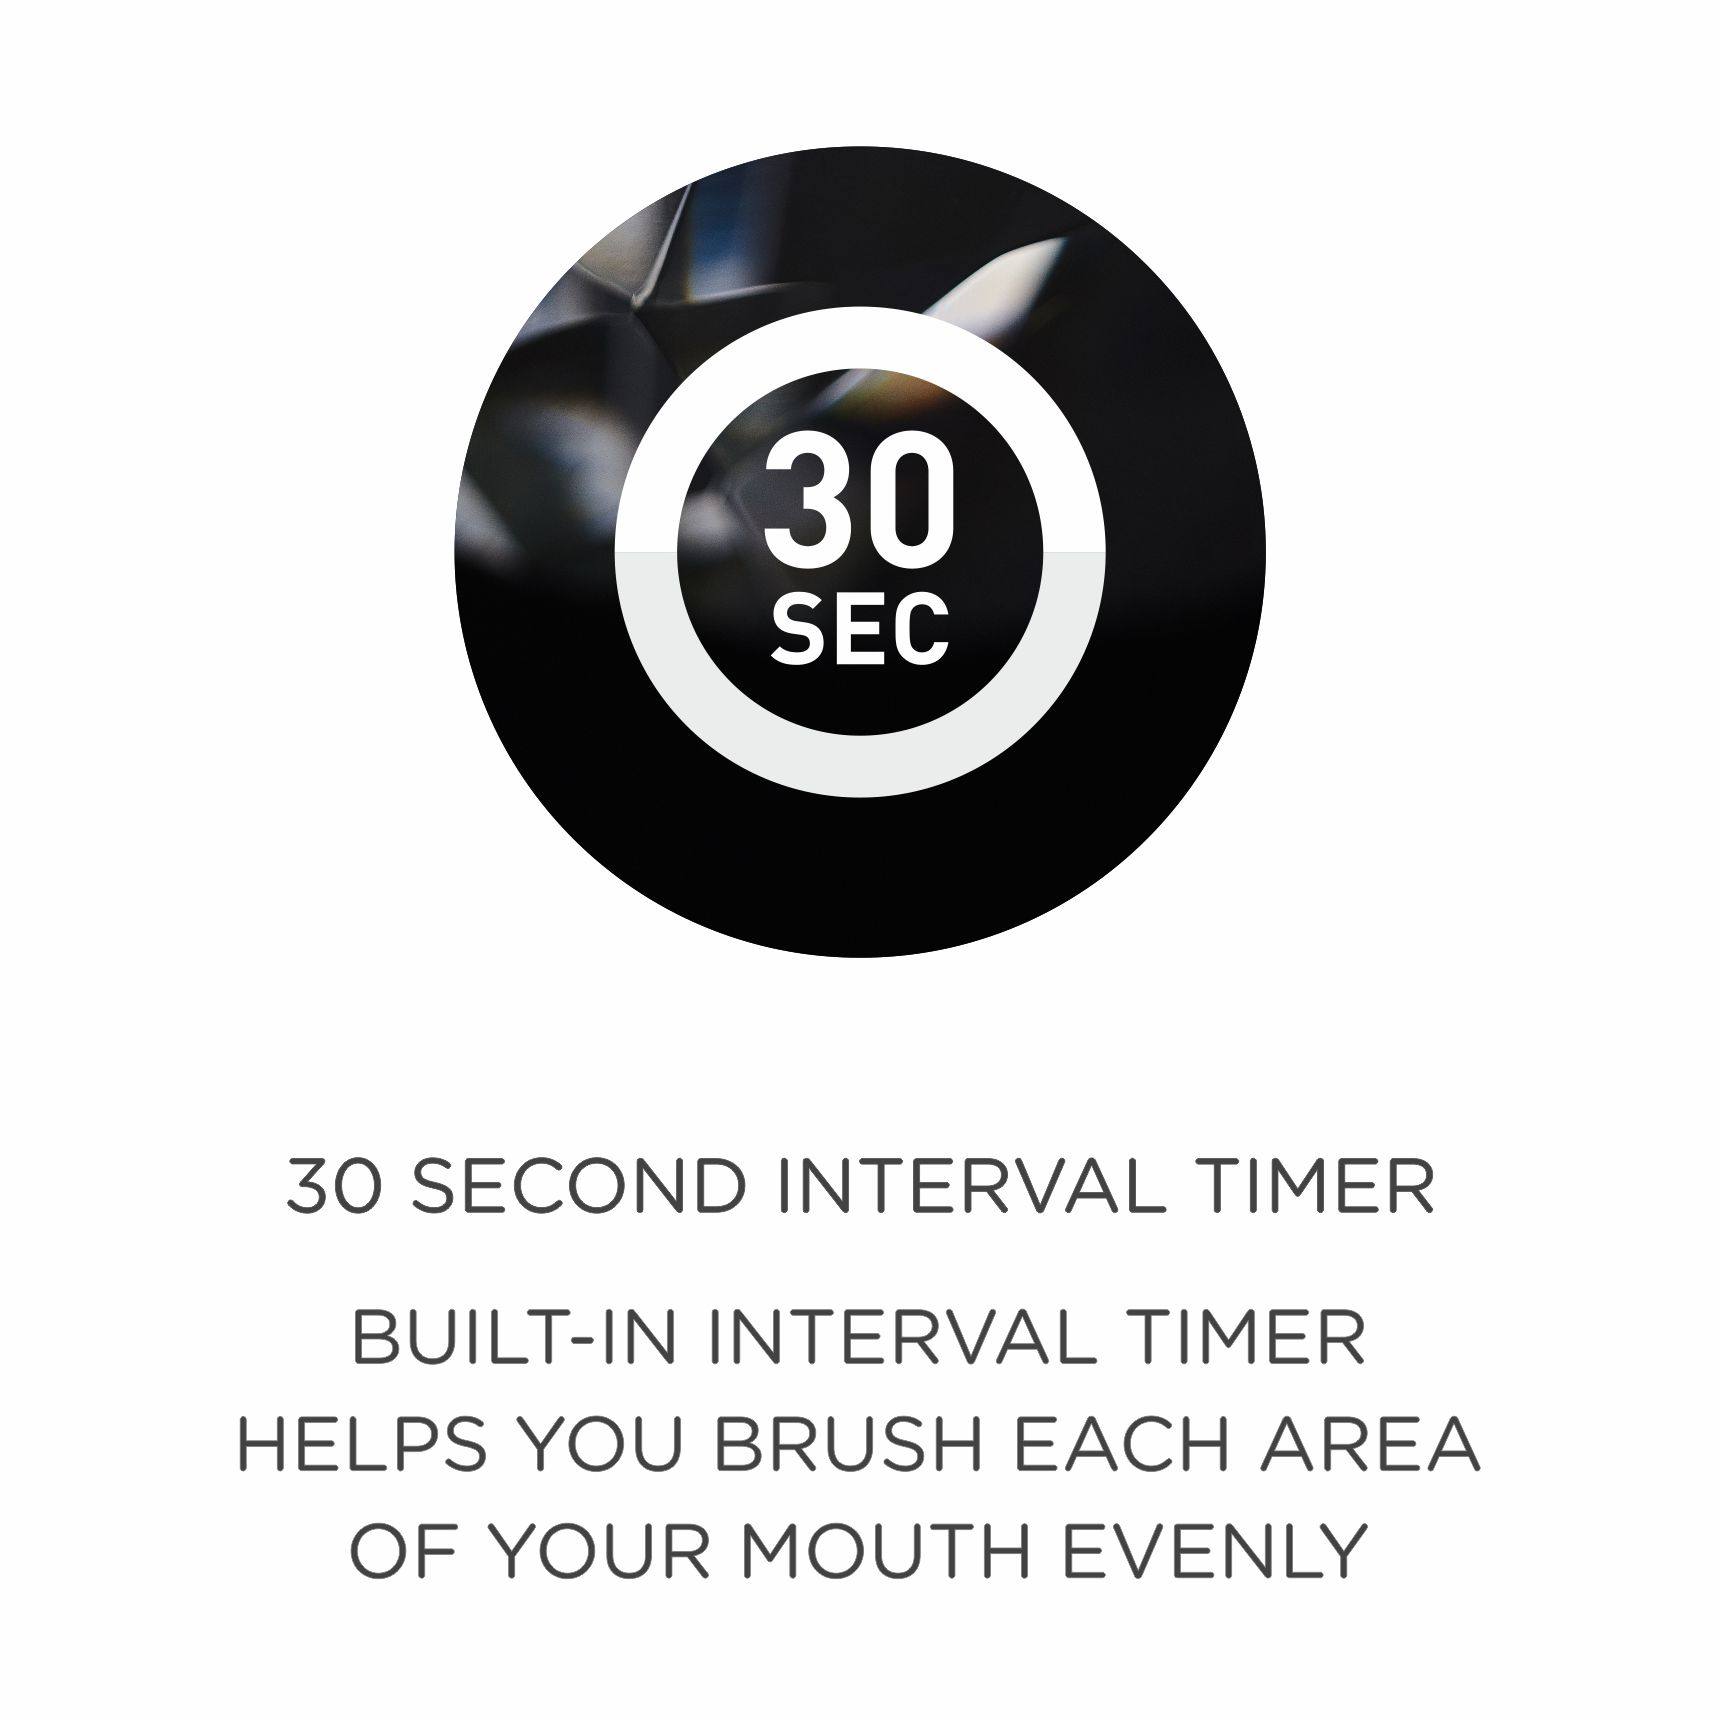 Toothbrush 30 Sec Timer Icon